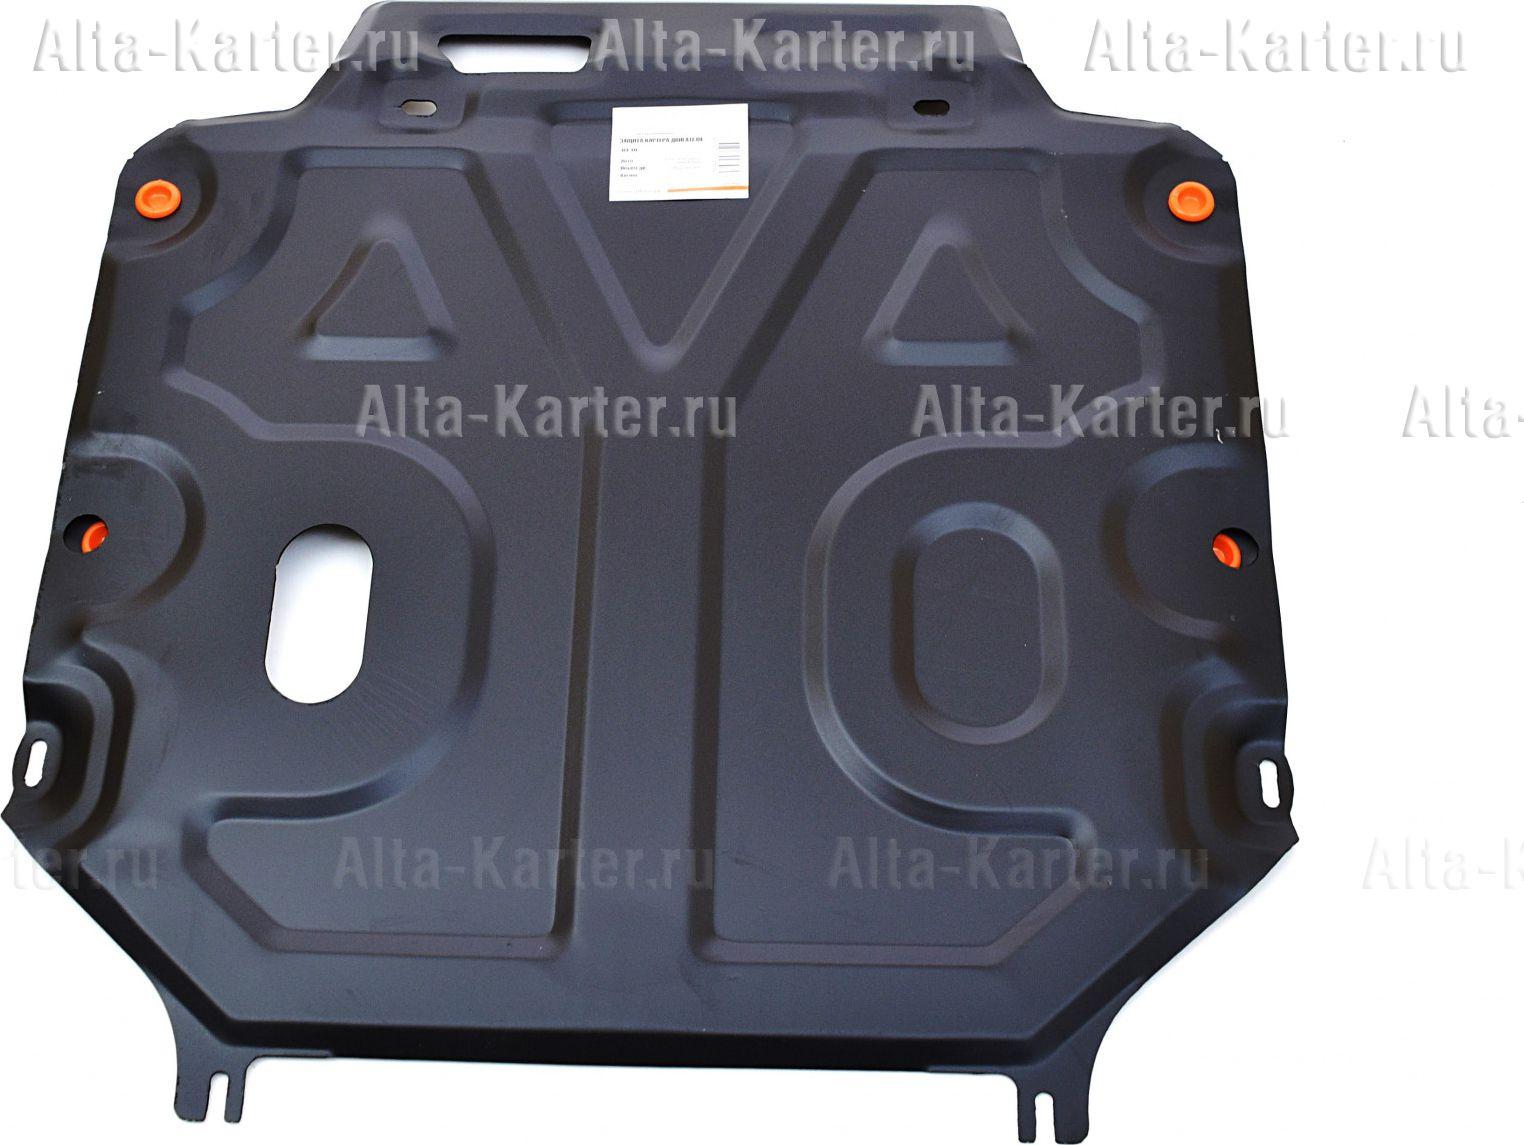 Защита Alfeco для картера и КПП Opel Antara 2011-2017. Артикул ALF.03.16